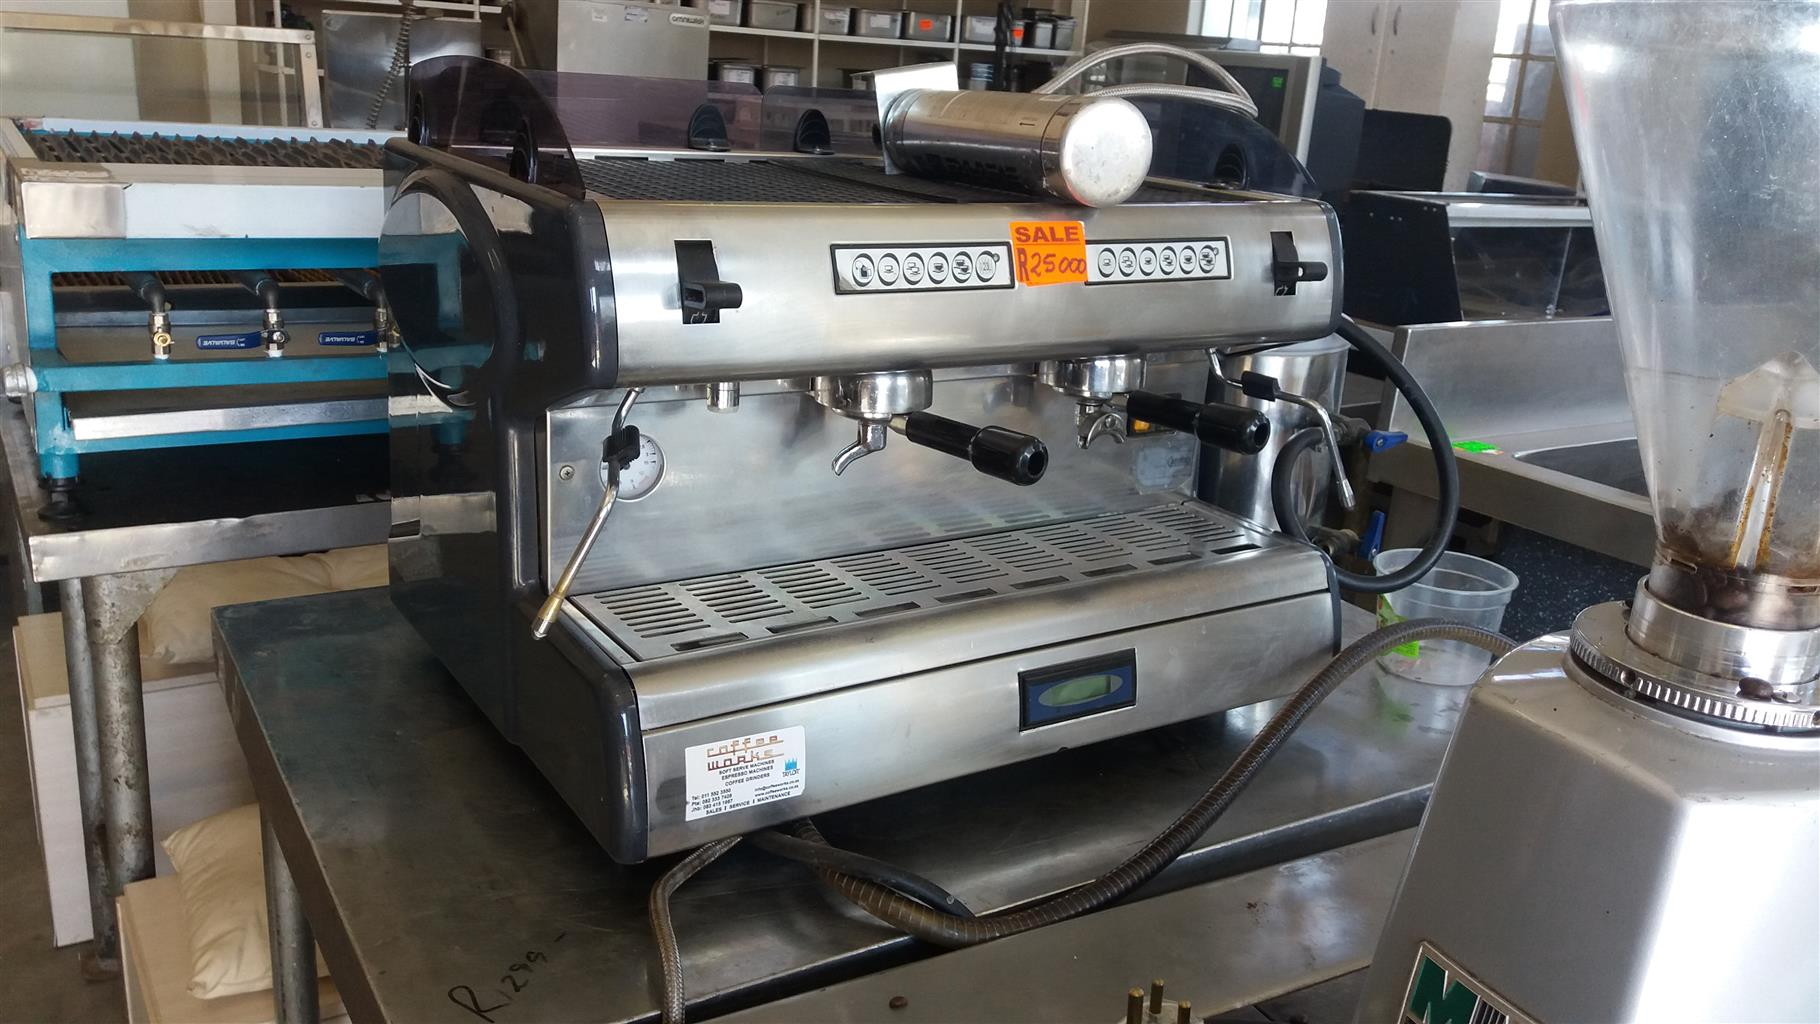 Carimali coffee machine with grinder